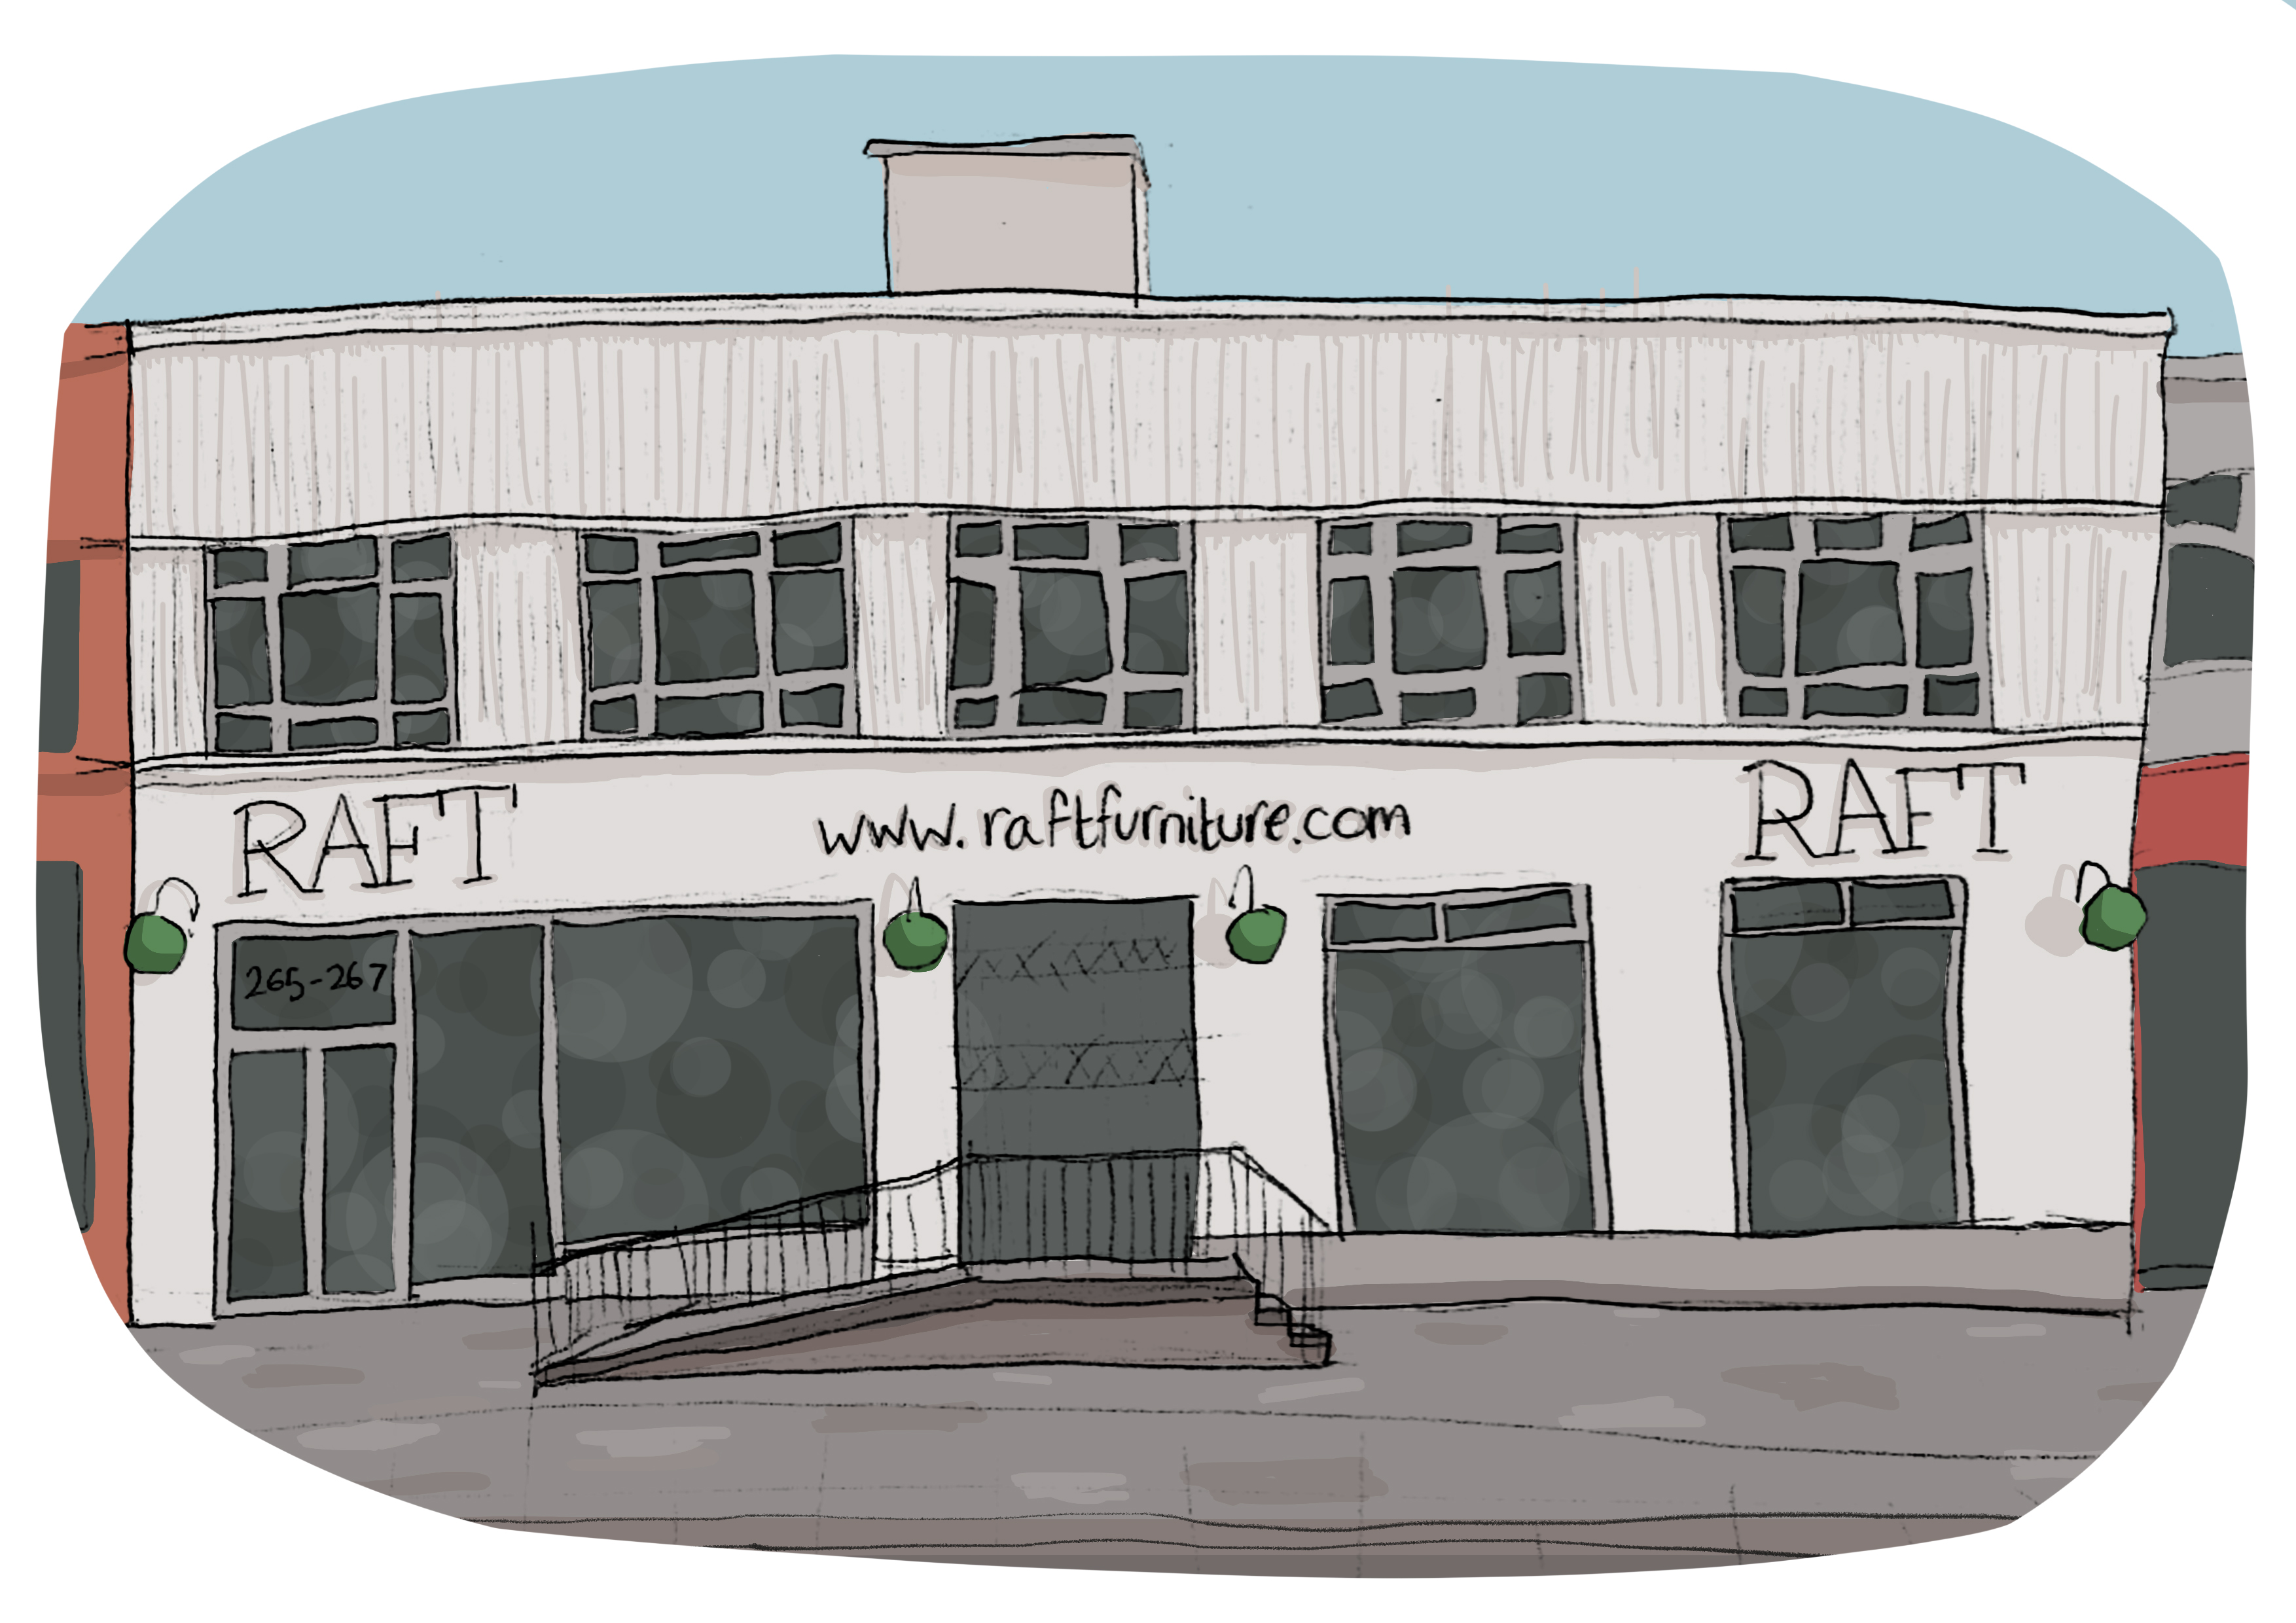 Raft Furniture